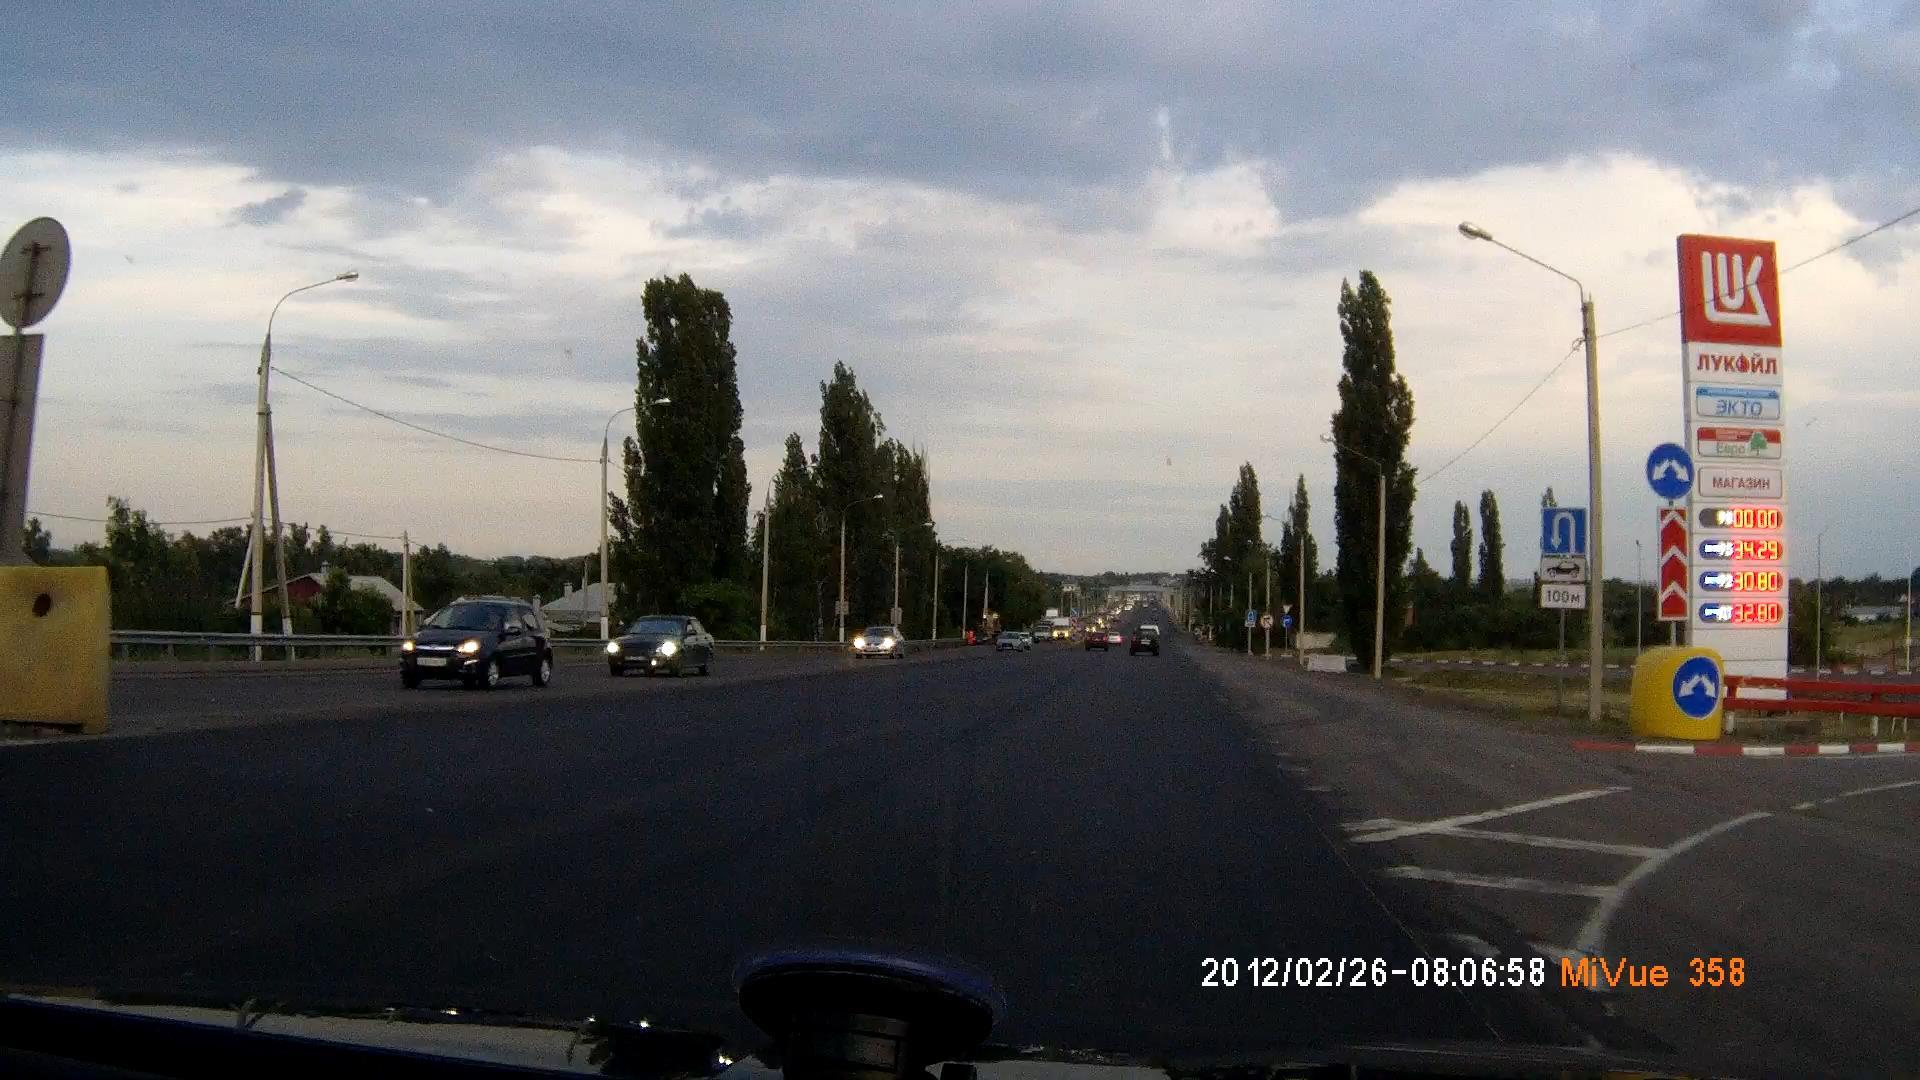 http://se.uploads.ru/DMgmx.jpg